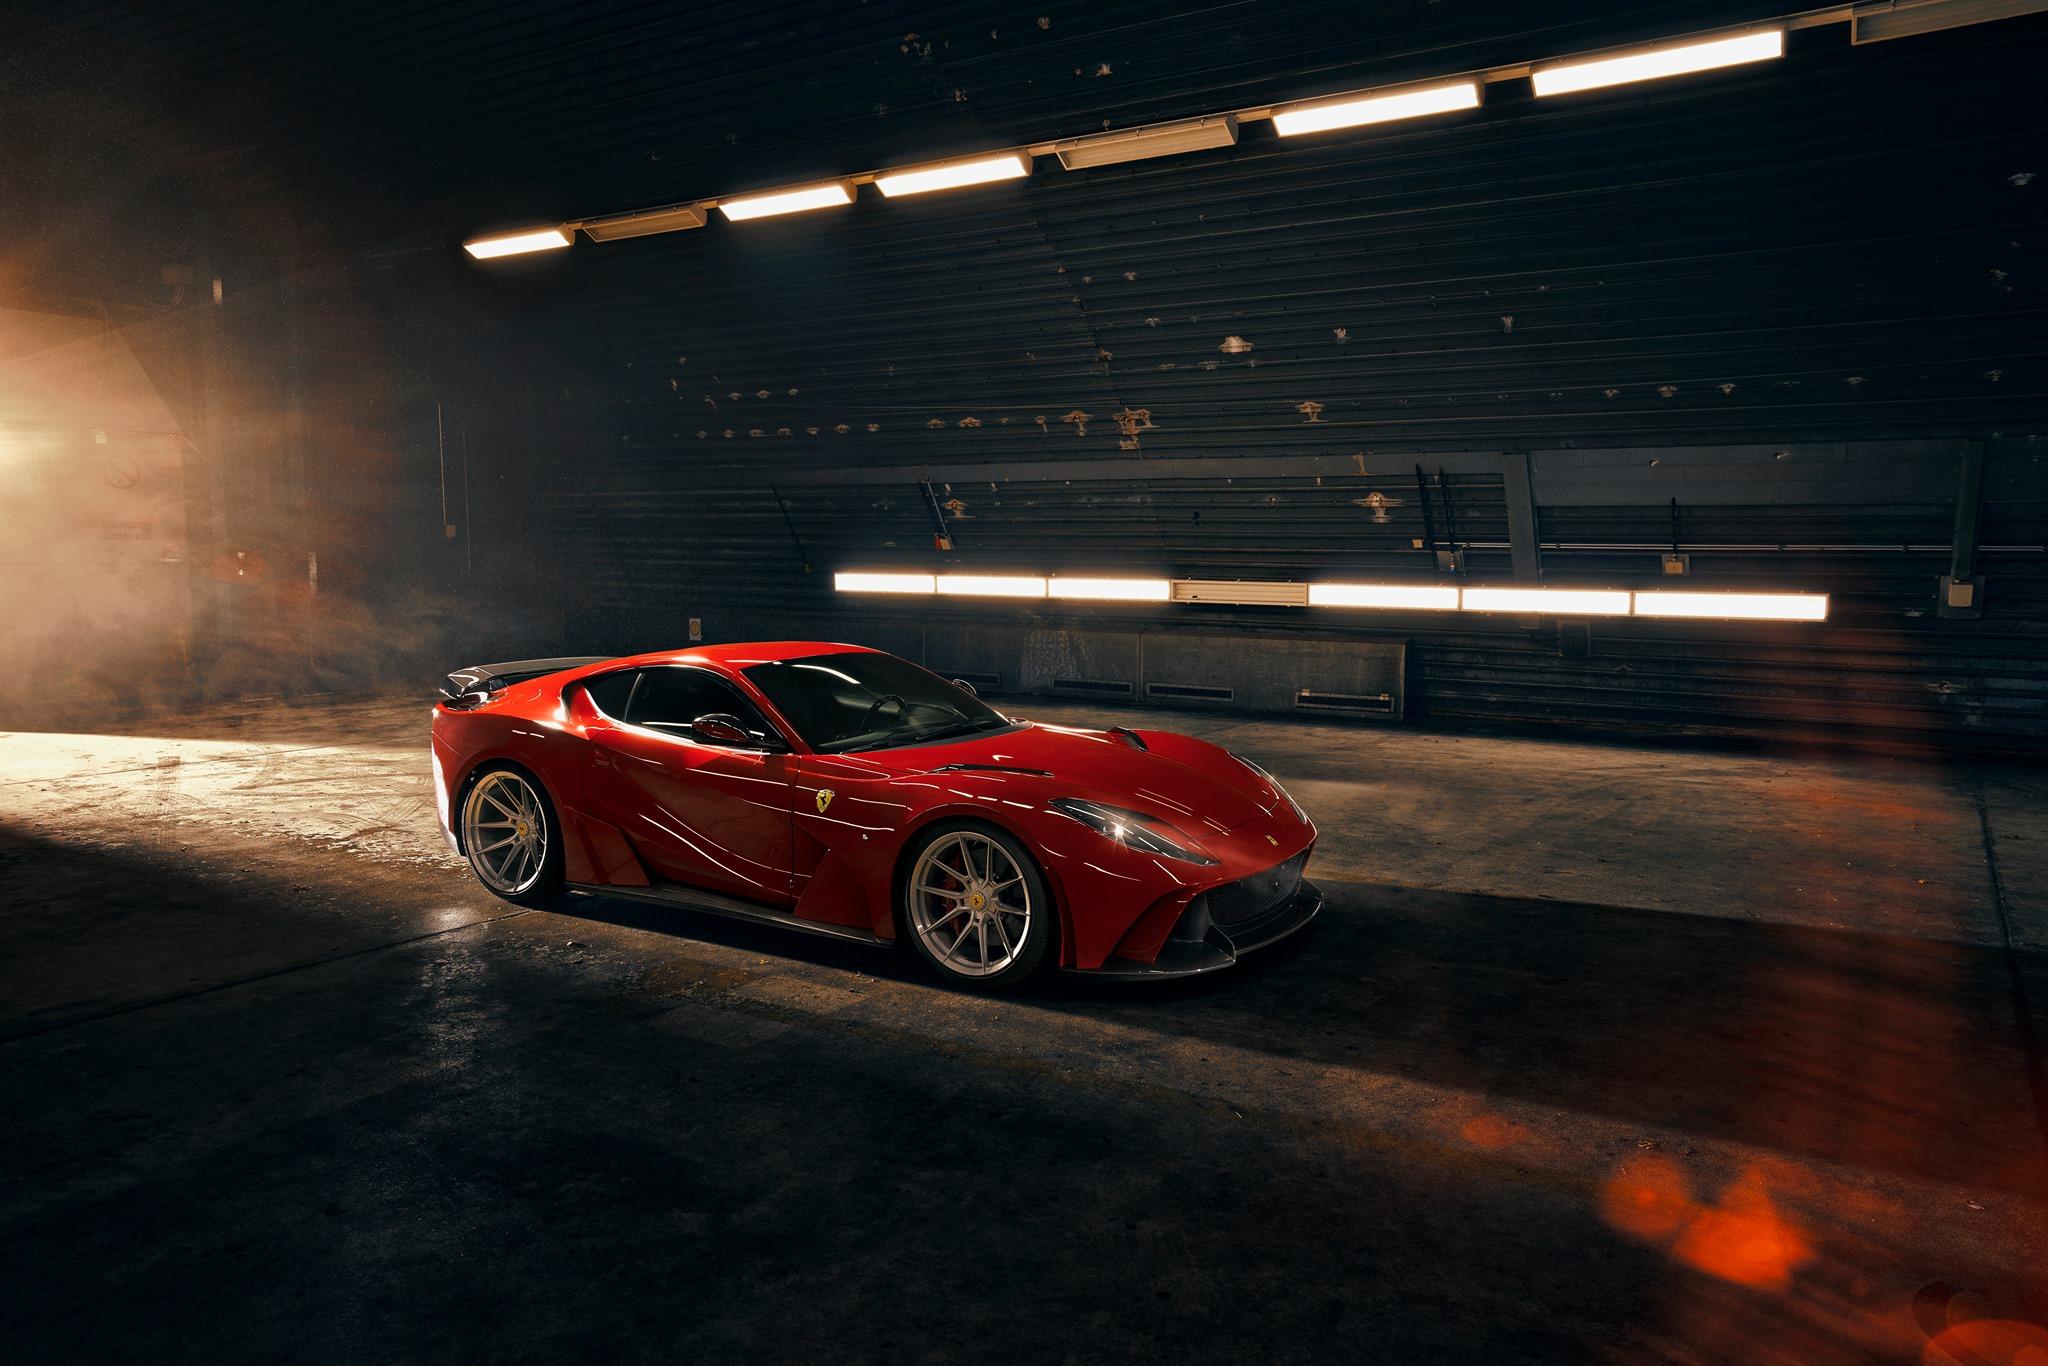 Ferrari-812-Superfast-N-Largo-by-Novitec-1